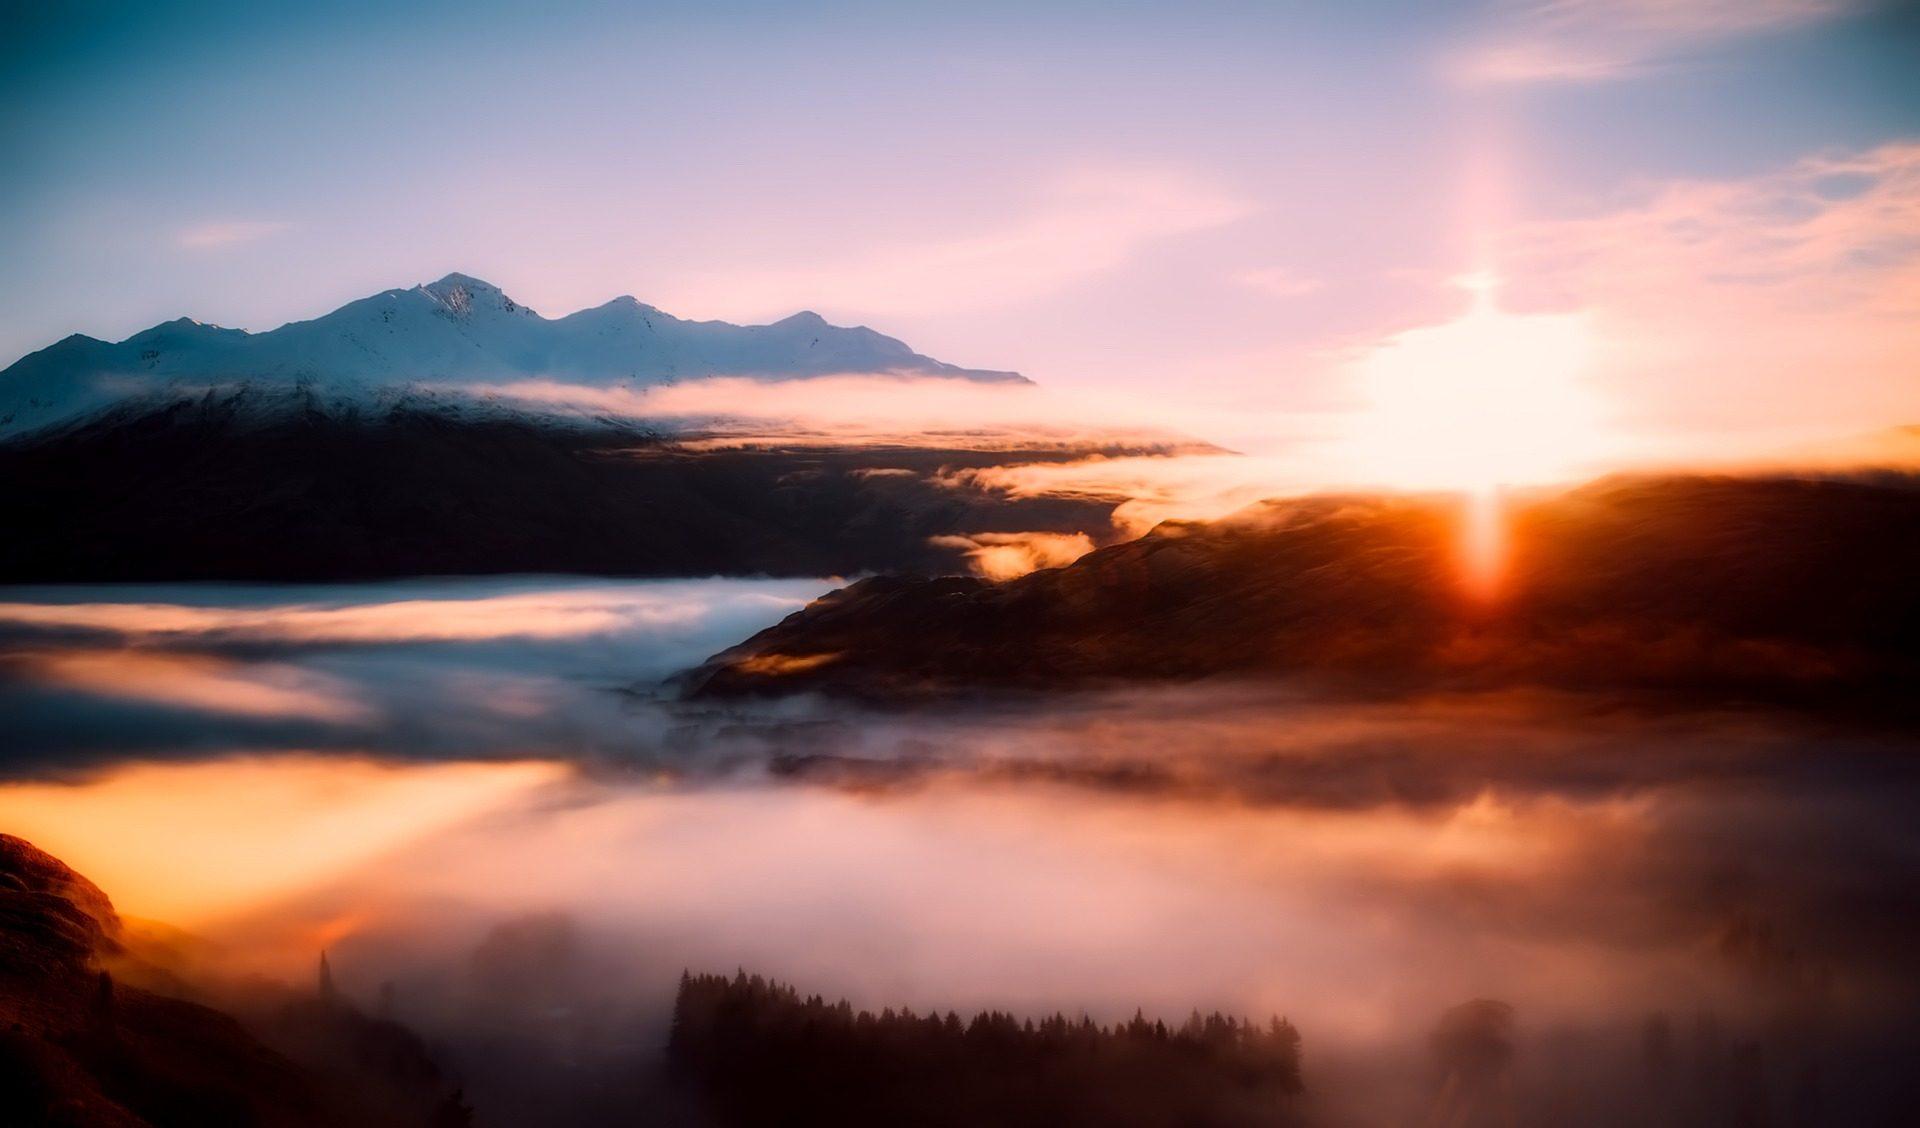 Montañas, σύννεφα, ύψη, Κυρ, ακτίνες, χιόνι, Νέα Ζηλανδία - Wallpapers HD - Professor-falken.com